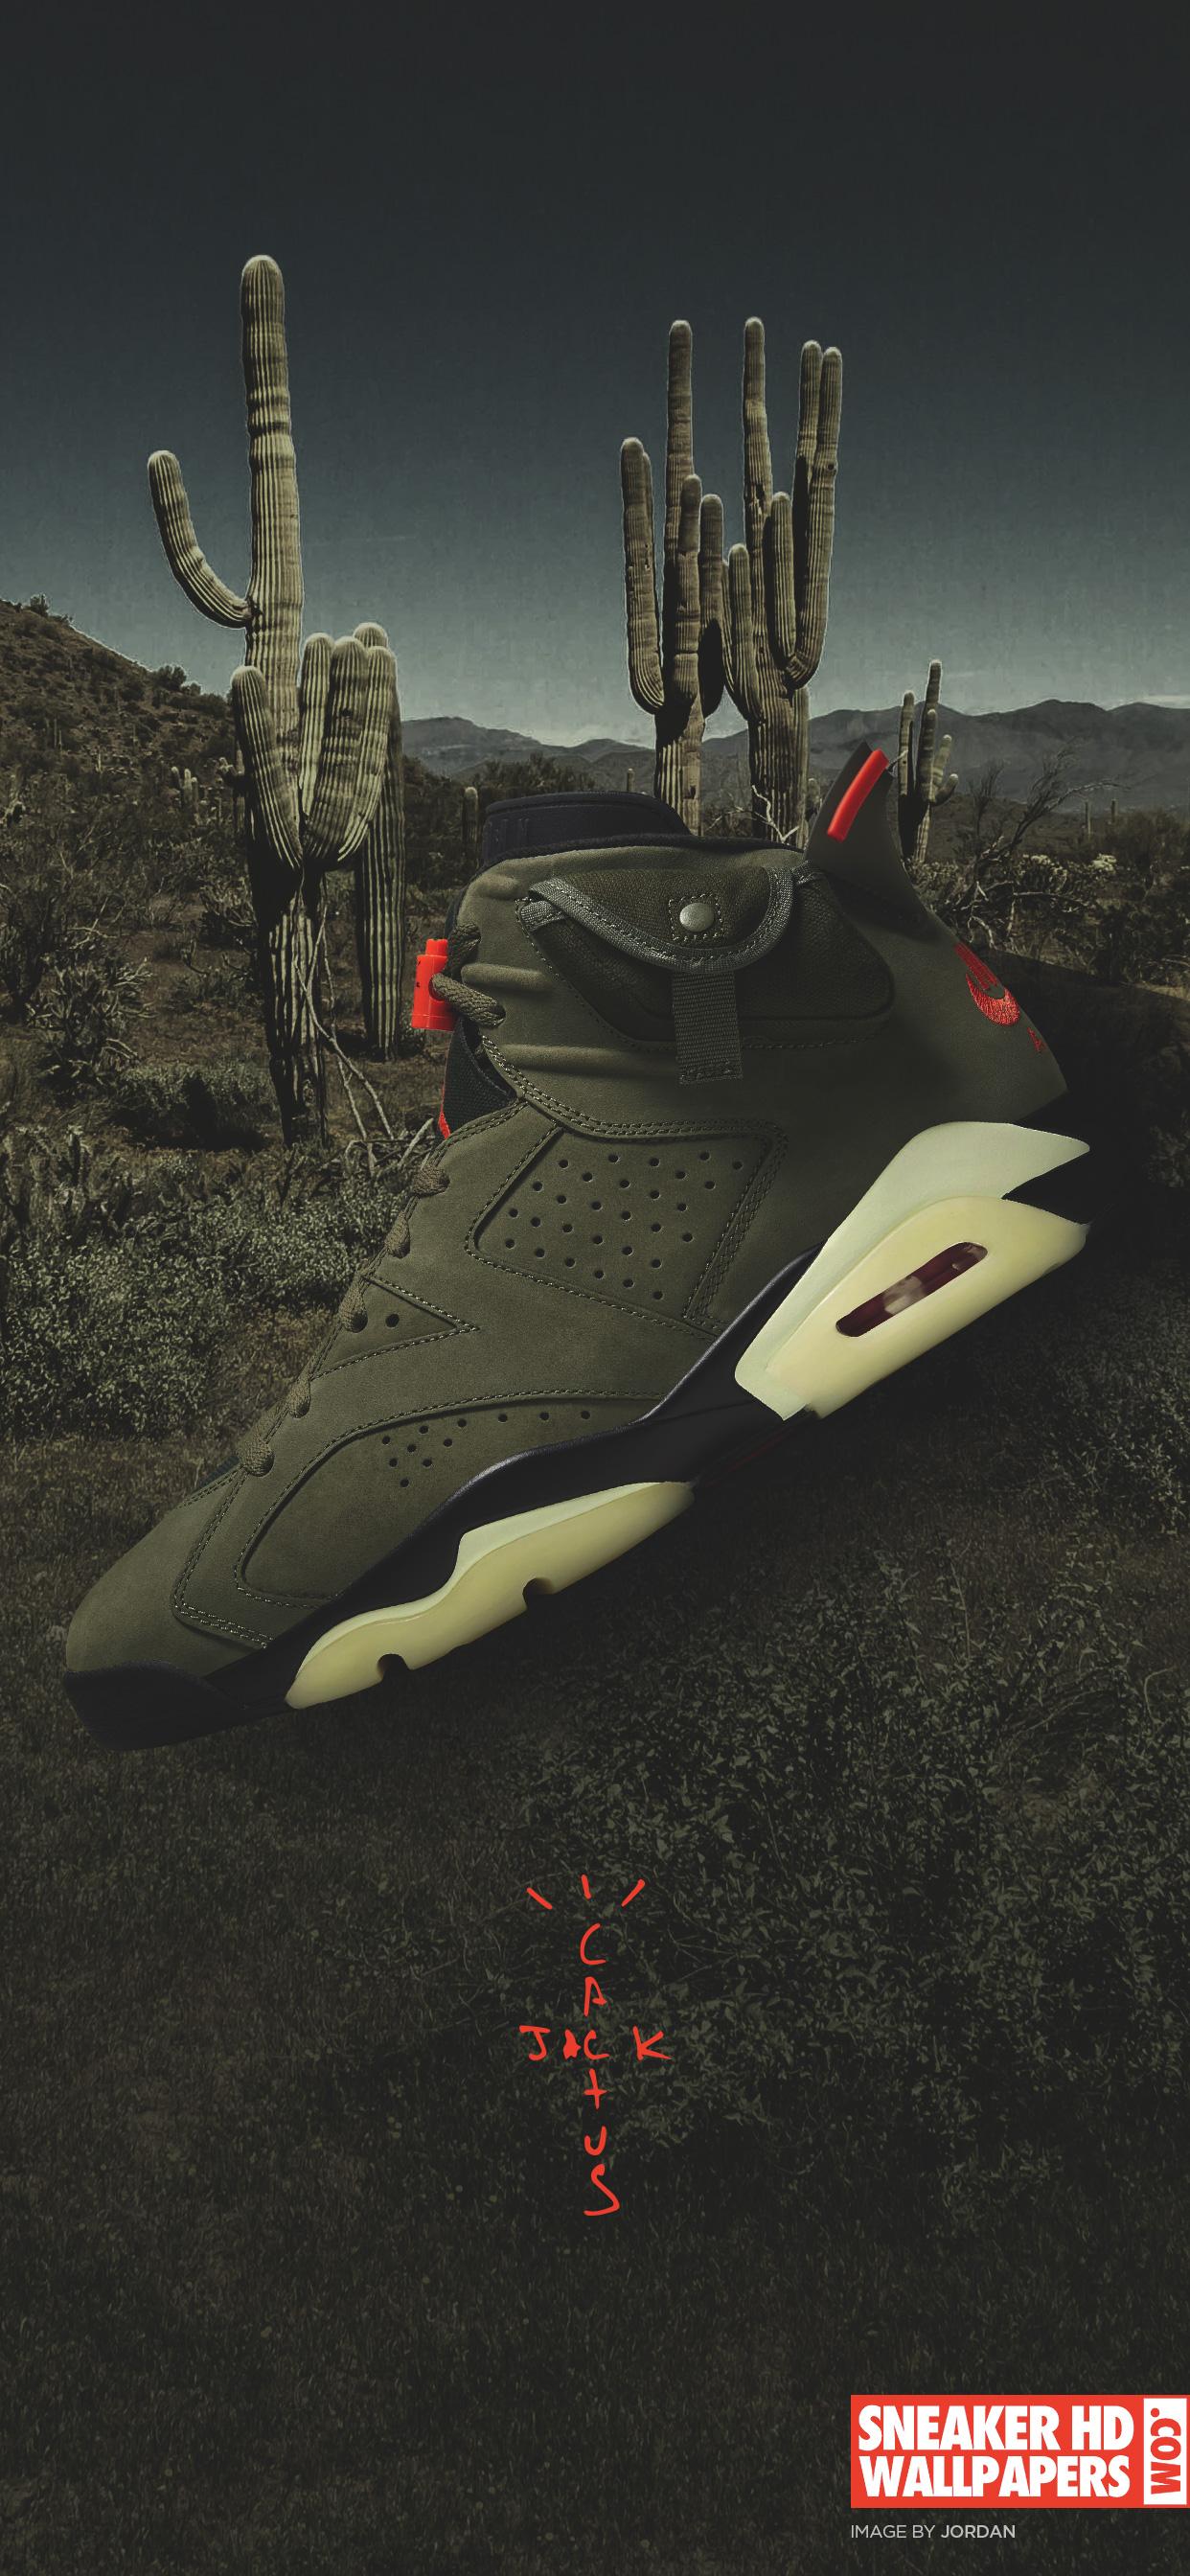 Hd Supreme Wallpaper Iphone X Sneakerhdwallpapers Com Your Favorite Sneakers In Hd And